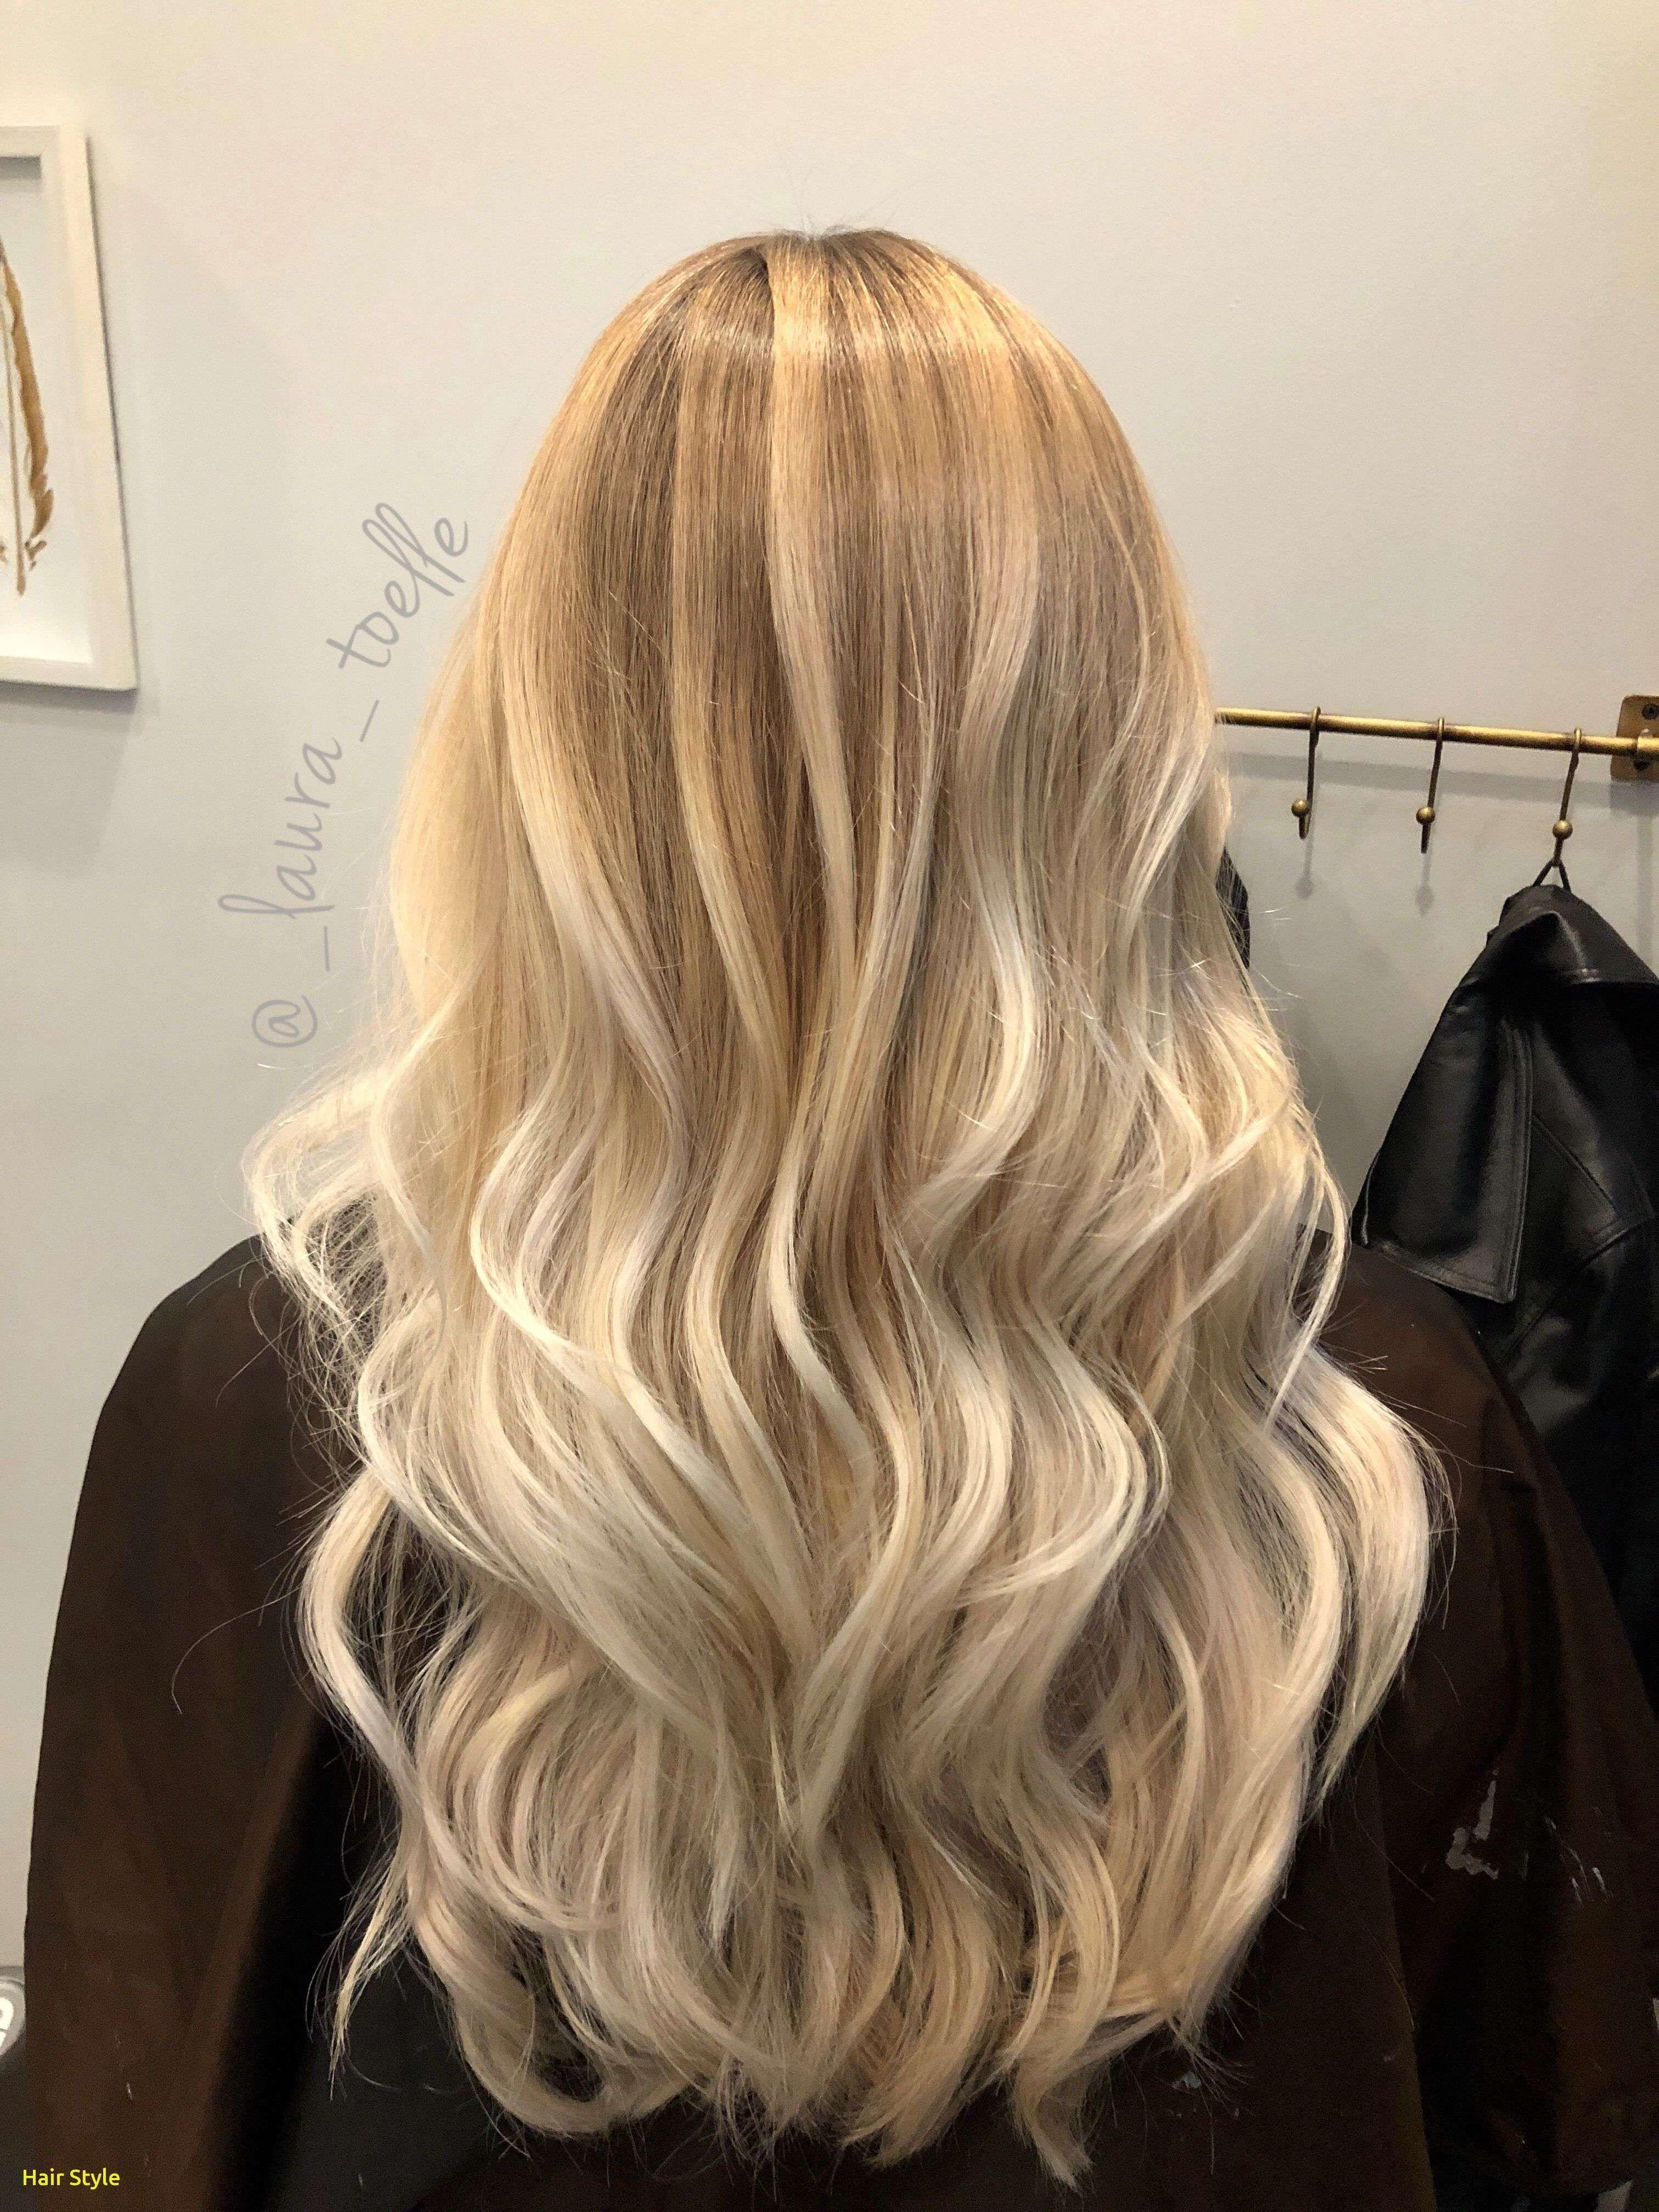 Elegante Bombshell Blonde Balayage #champagneblondehair Elegante Bombshell Blonde Balayage #balayagehairstyles #khloekardashian #blondehair